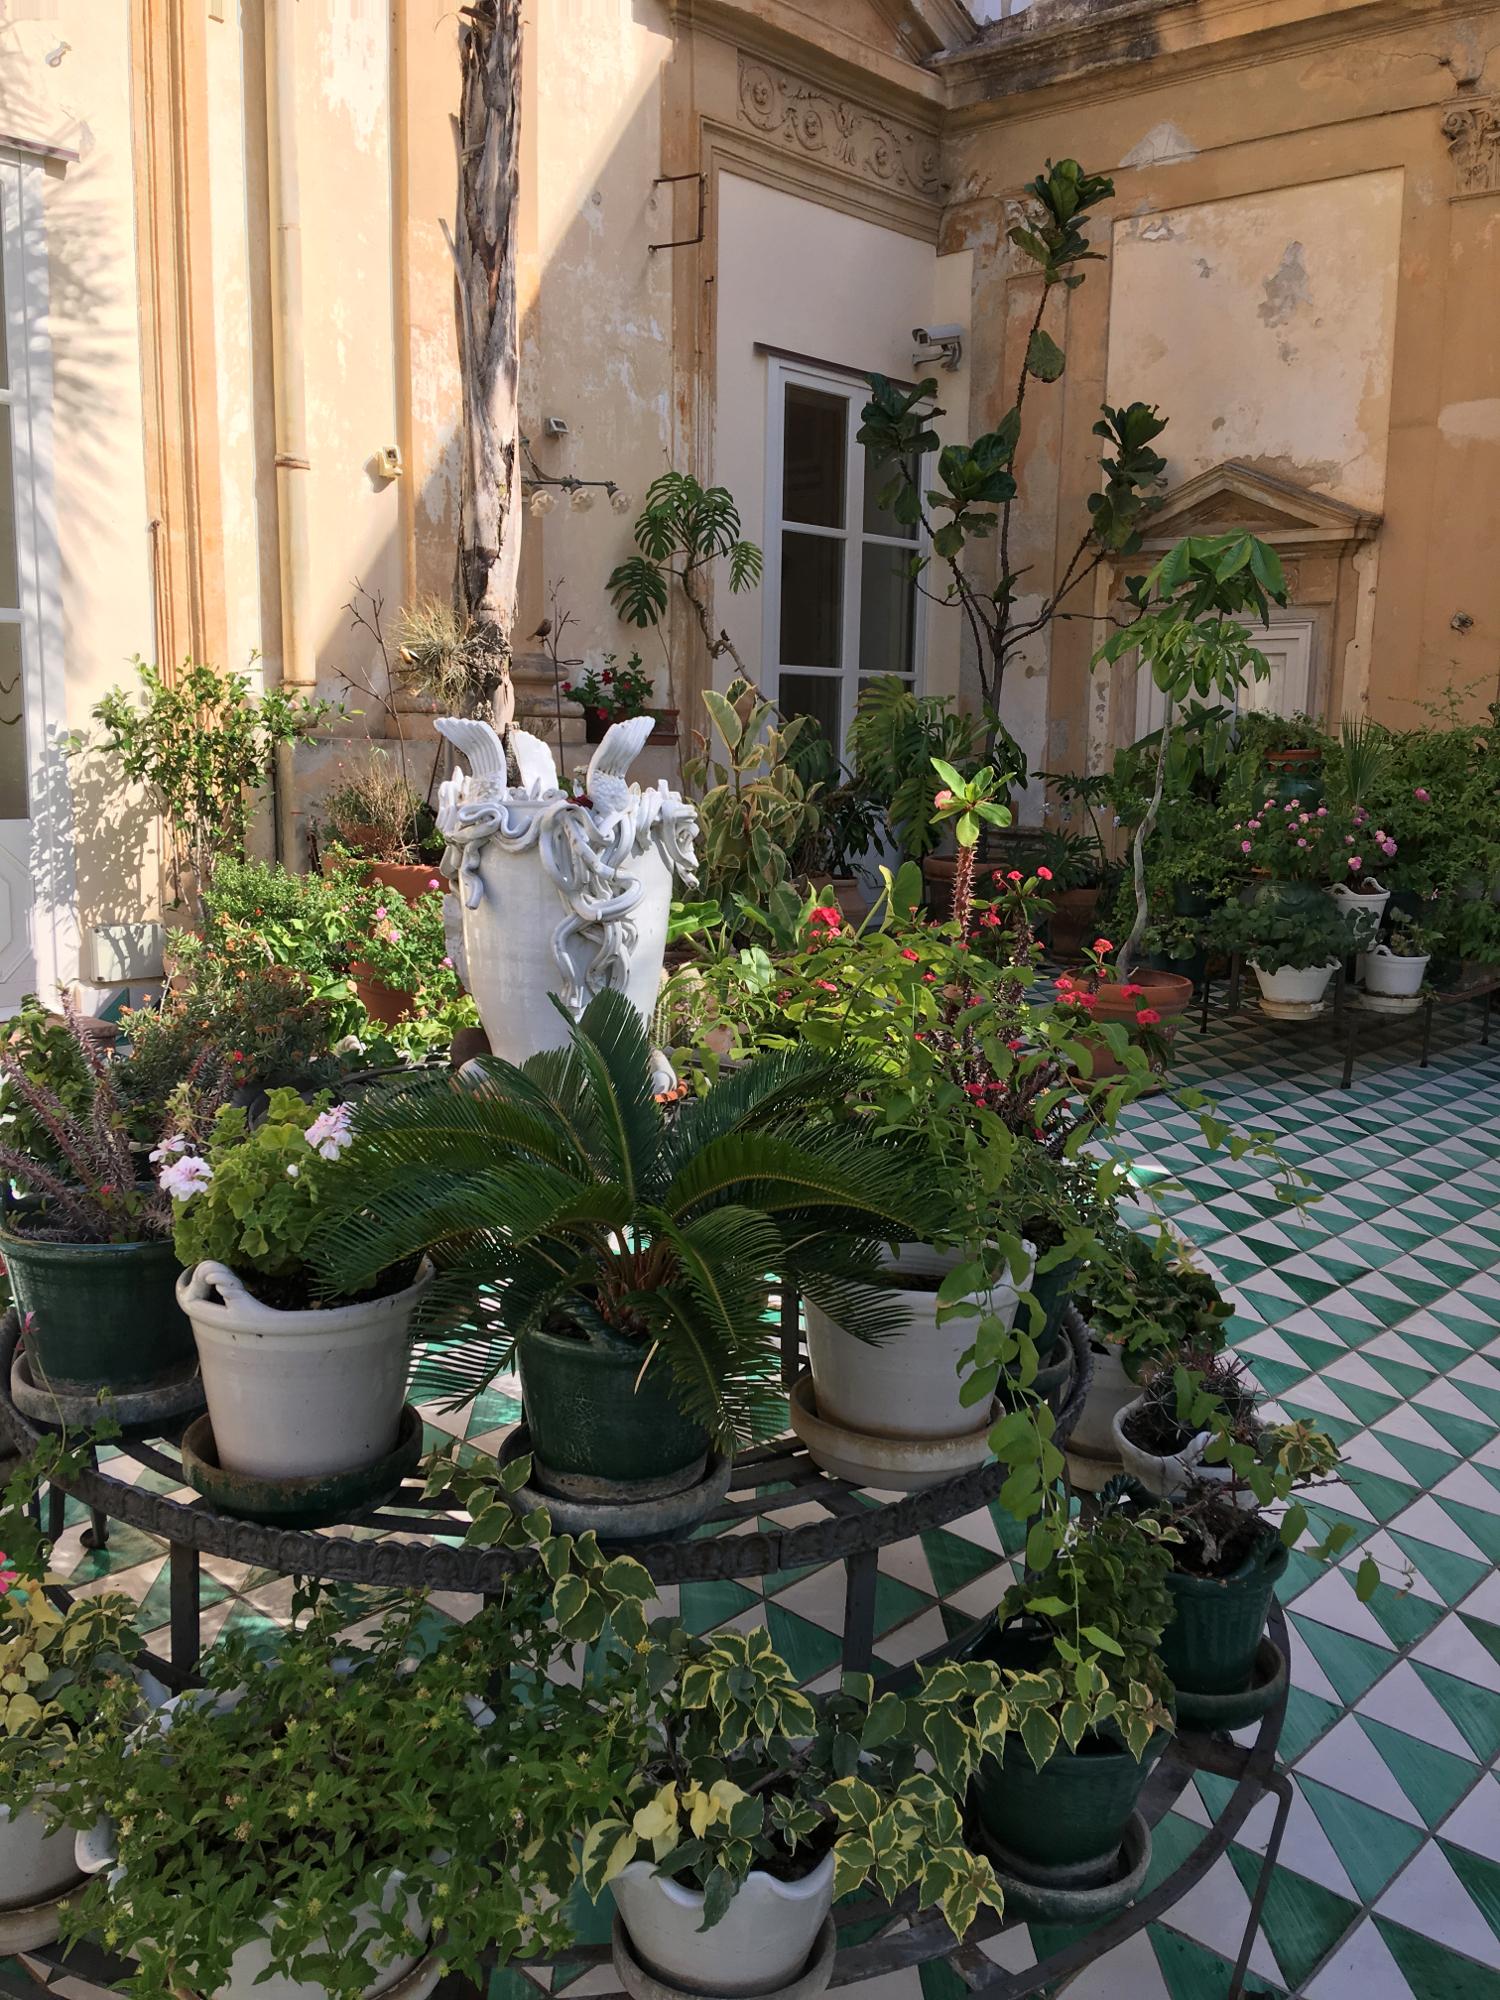 rocaille-blog-palermo-palazzo-valguarnera-gangi-gattopardo-9